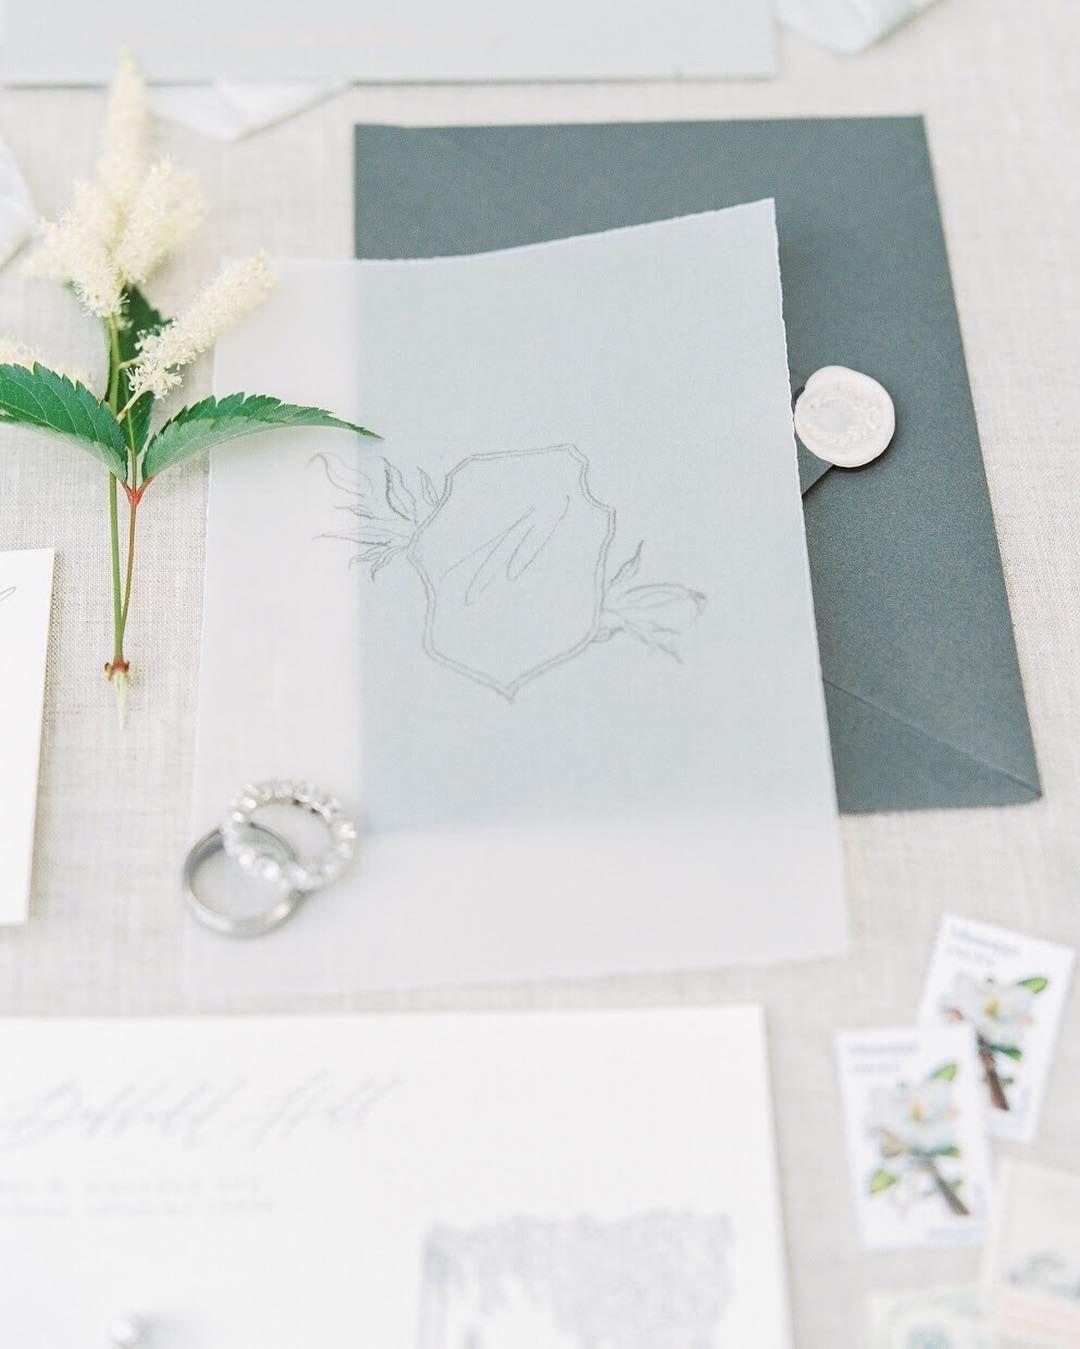 Vellum Wedding Invitations Stationery Oh Honey Paper Co Photo